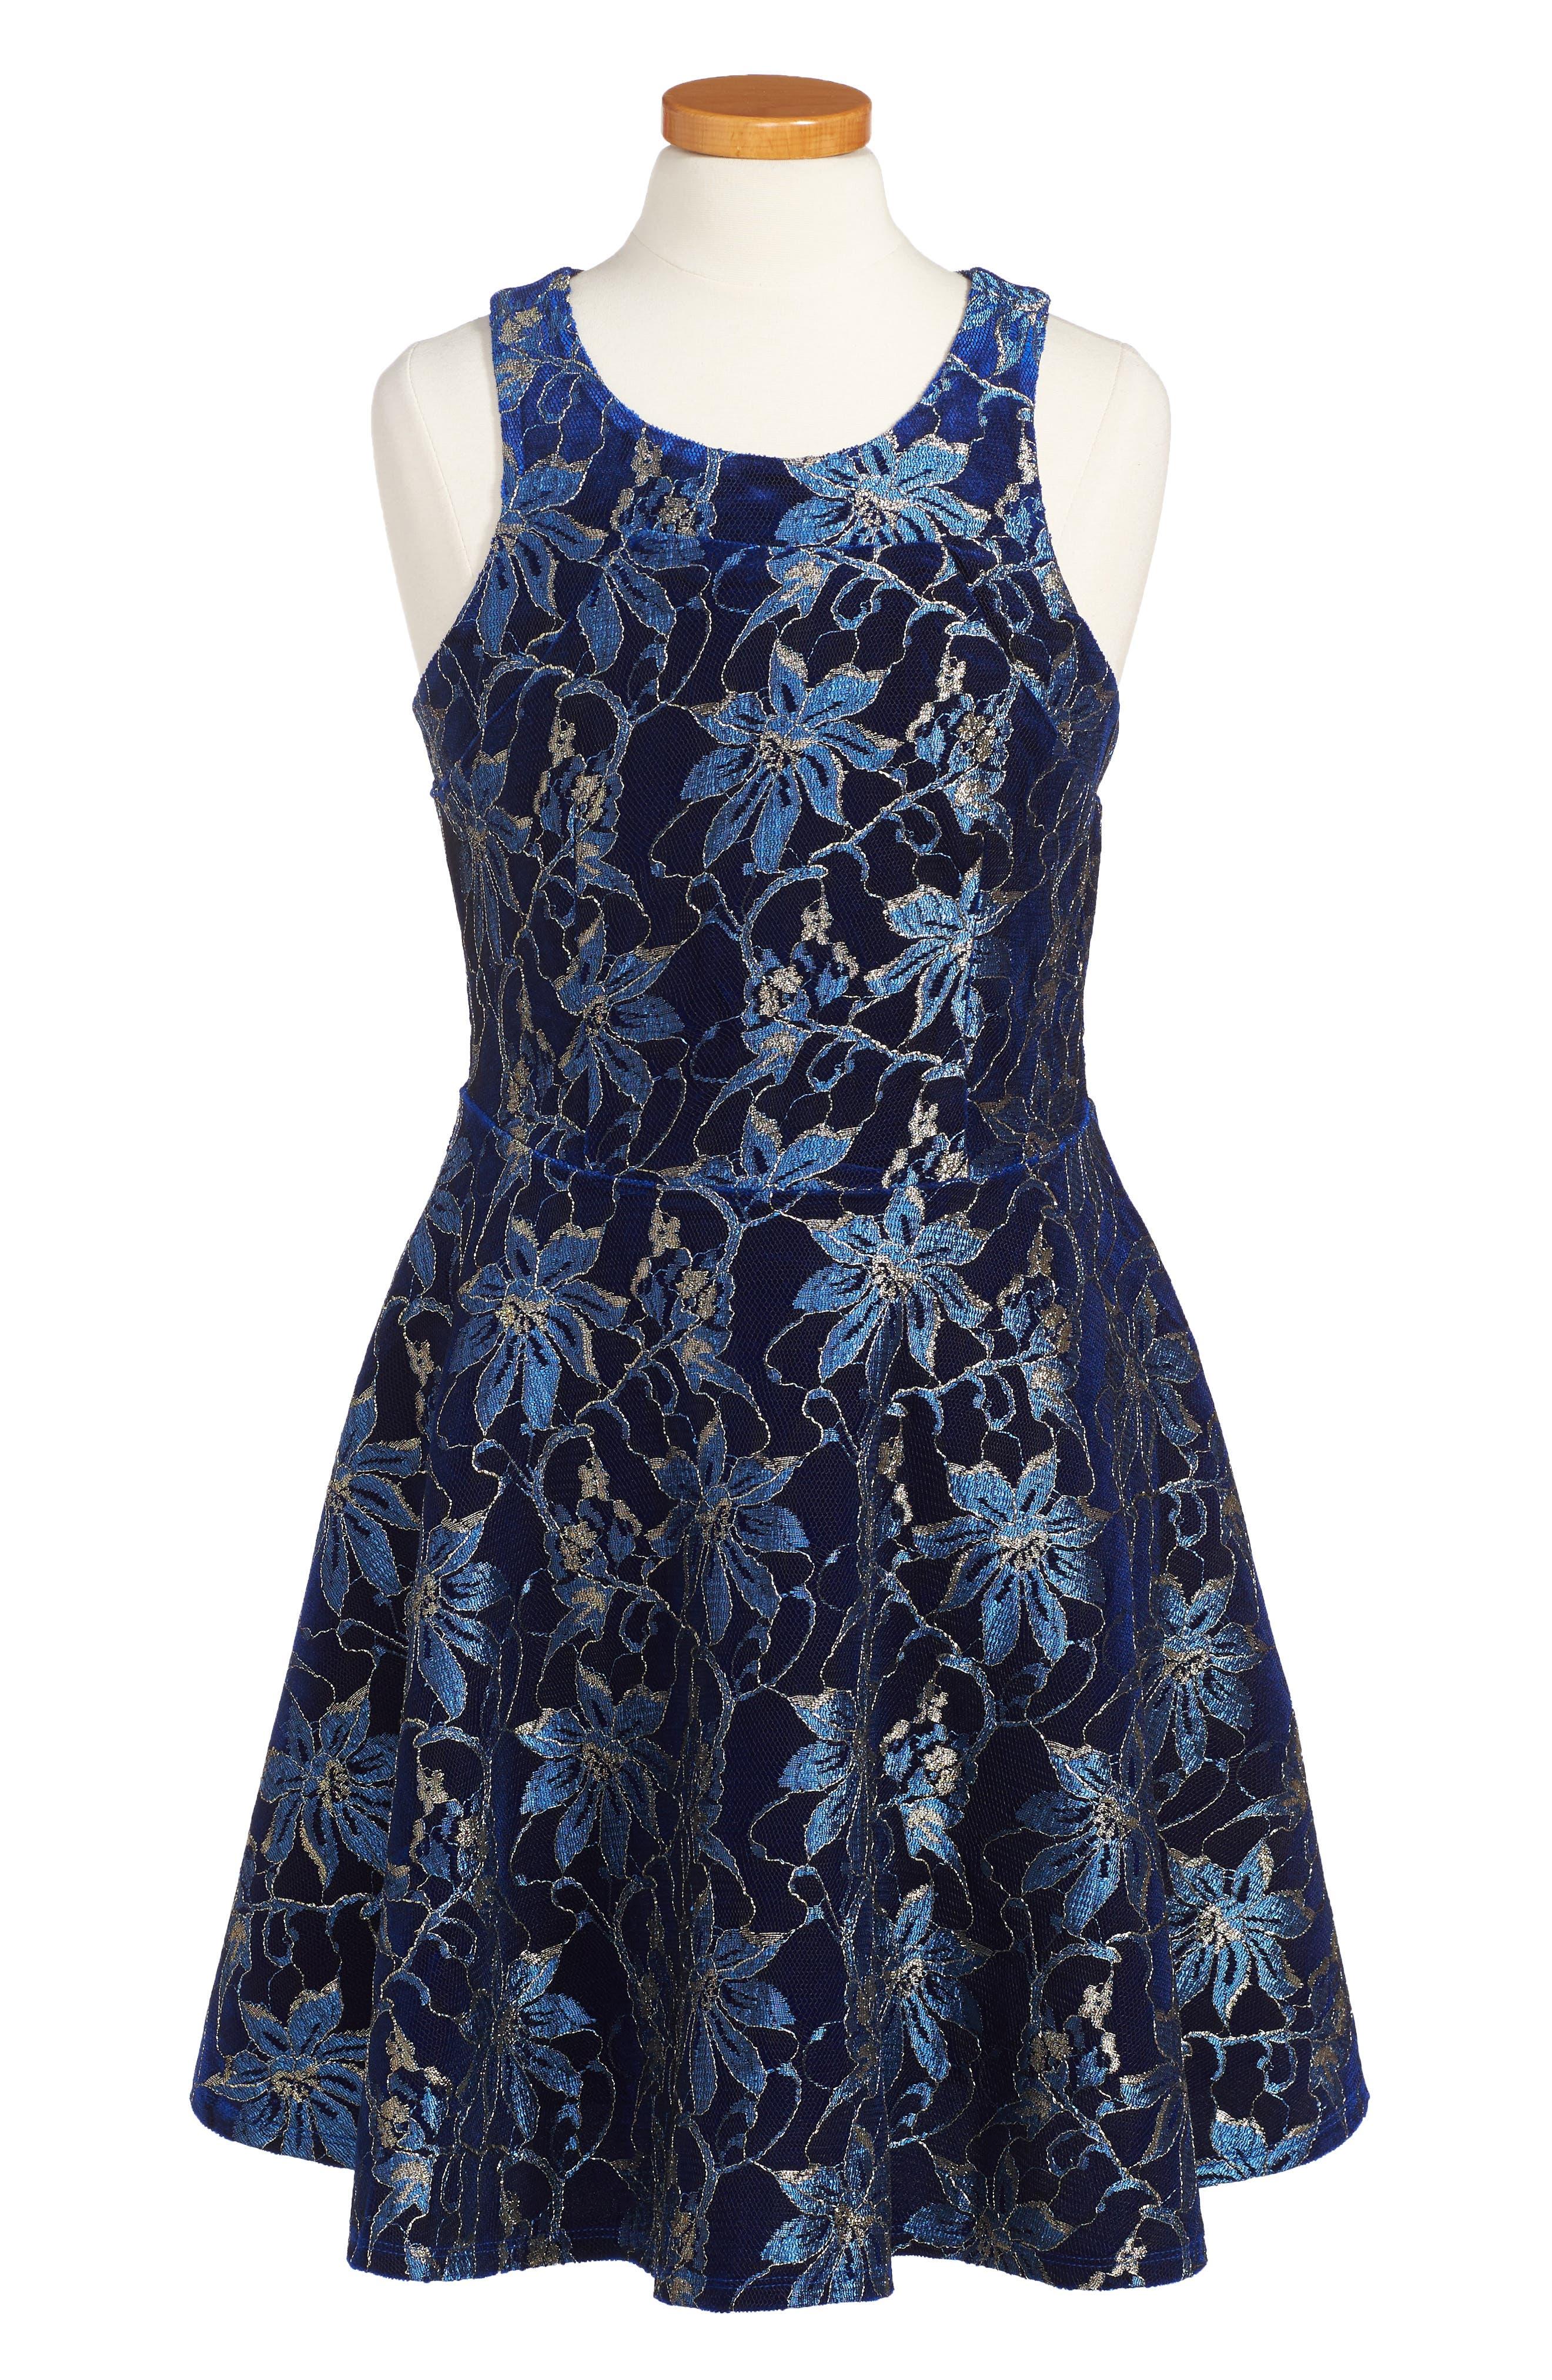 Heather Floral Mesh Dress,                             Main thumbnail 1, color,                             Royal Blue